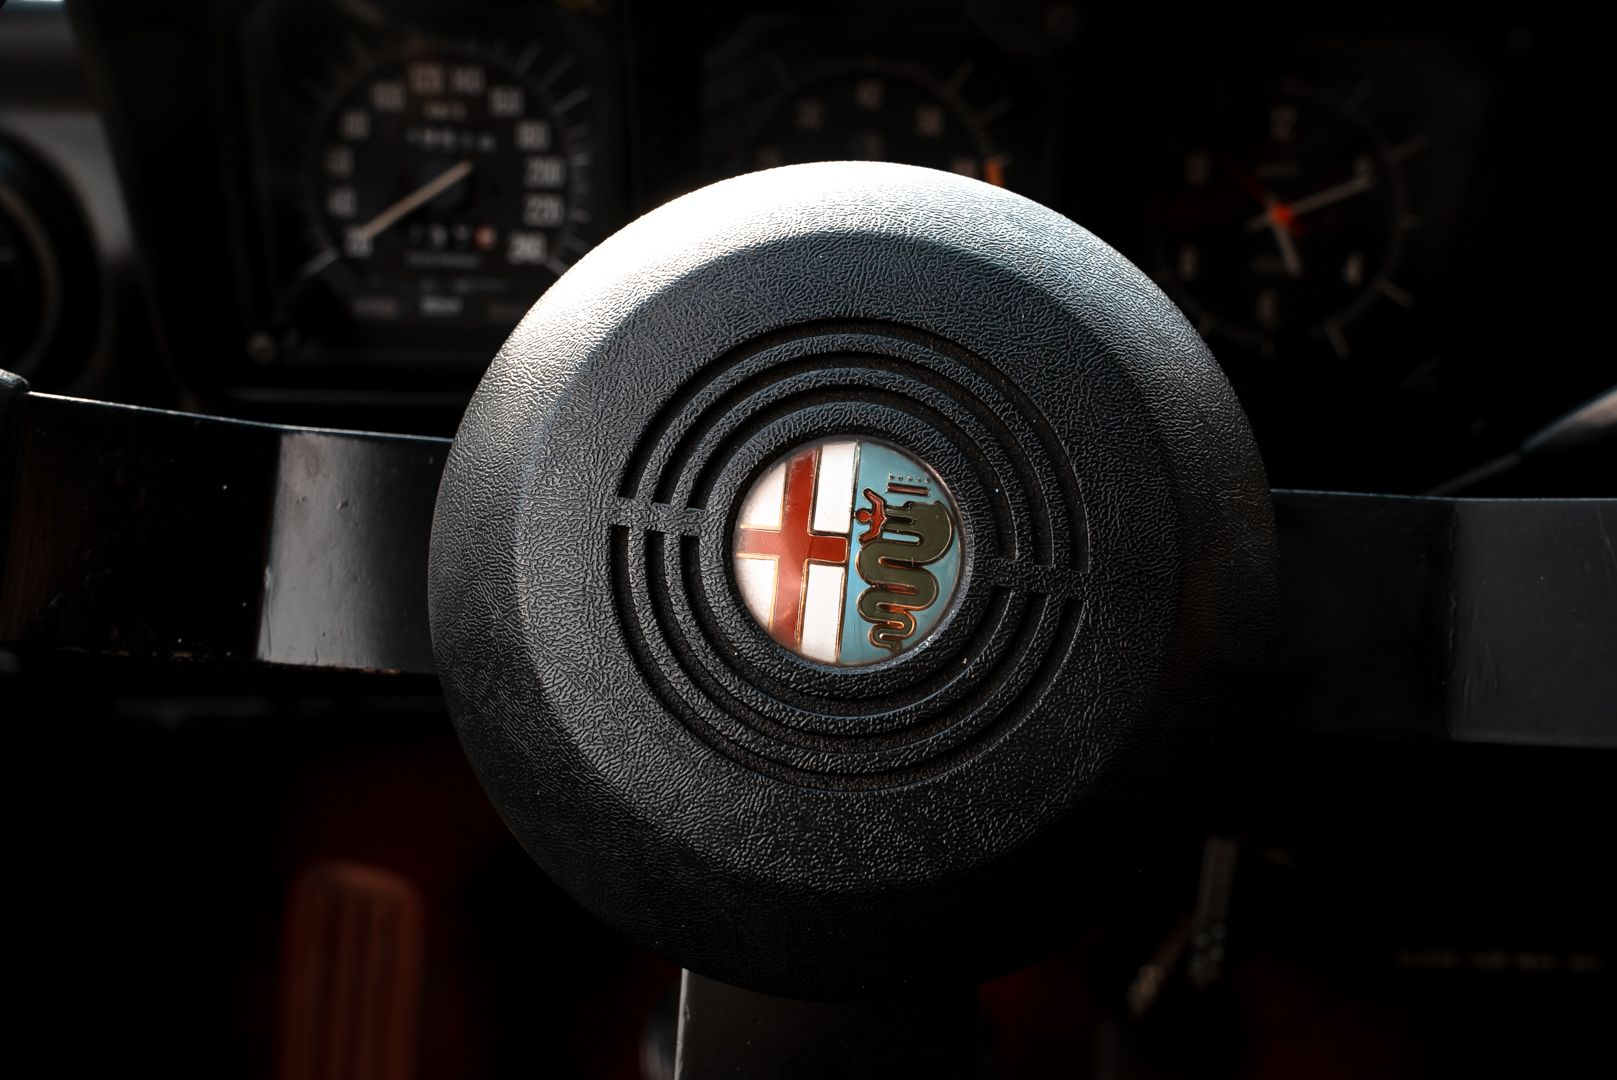 1981 Alfa Romeo Alfetta GTV Gran Prix n.128 68594